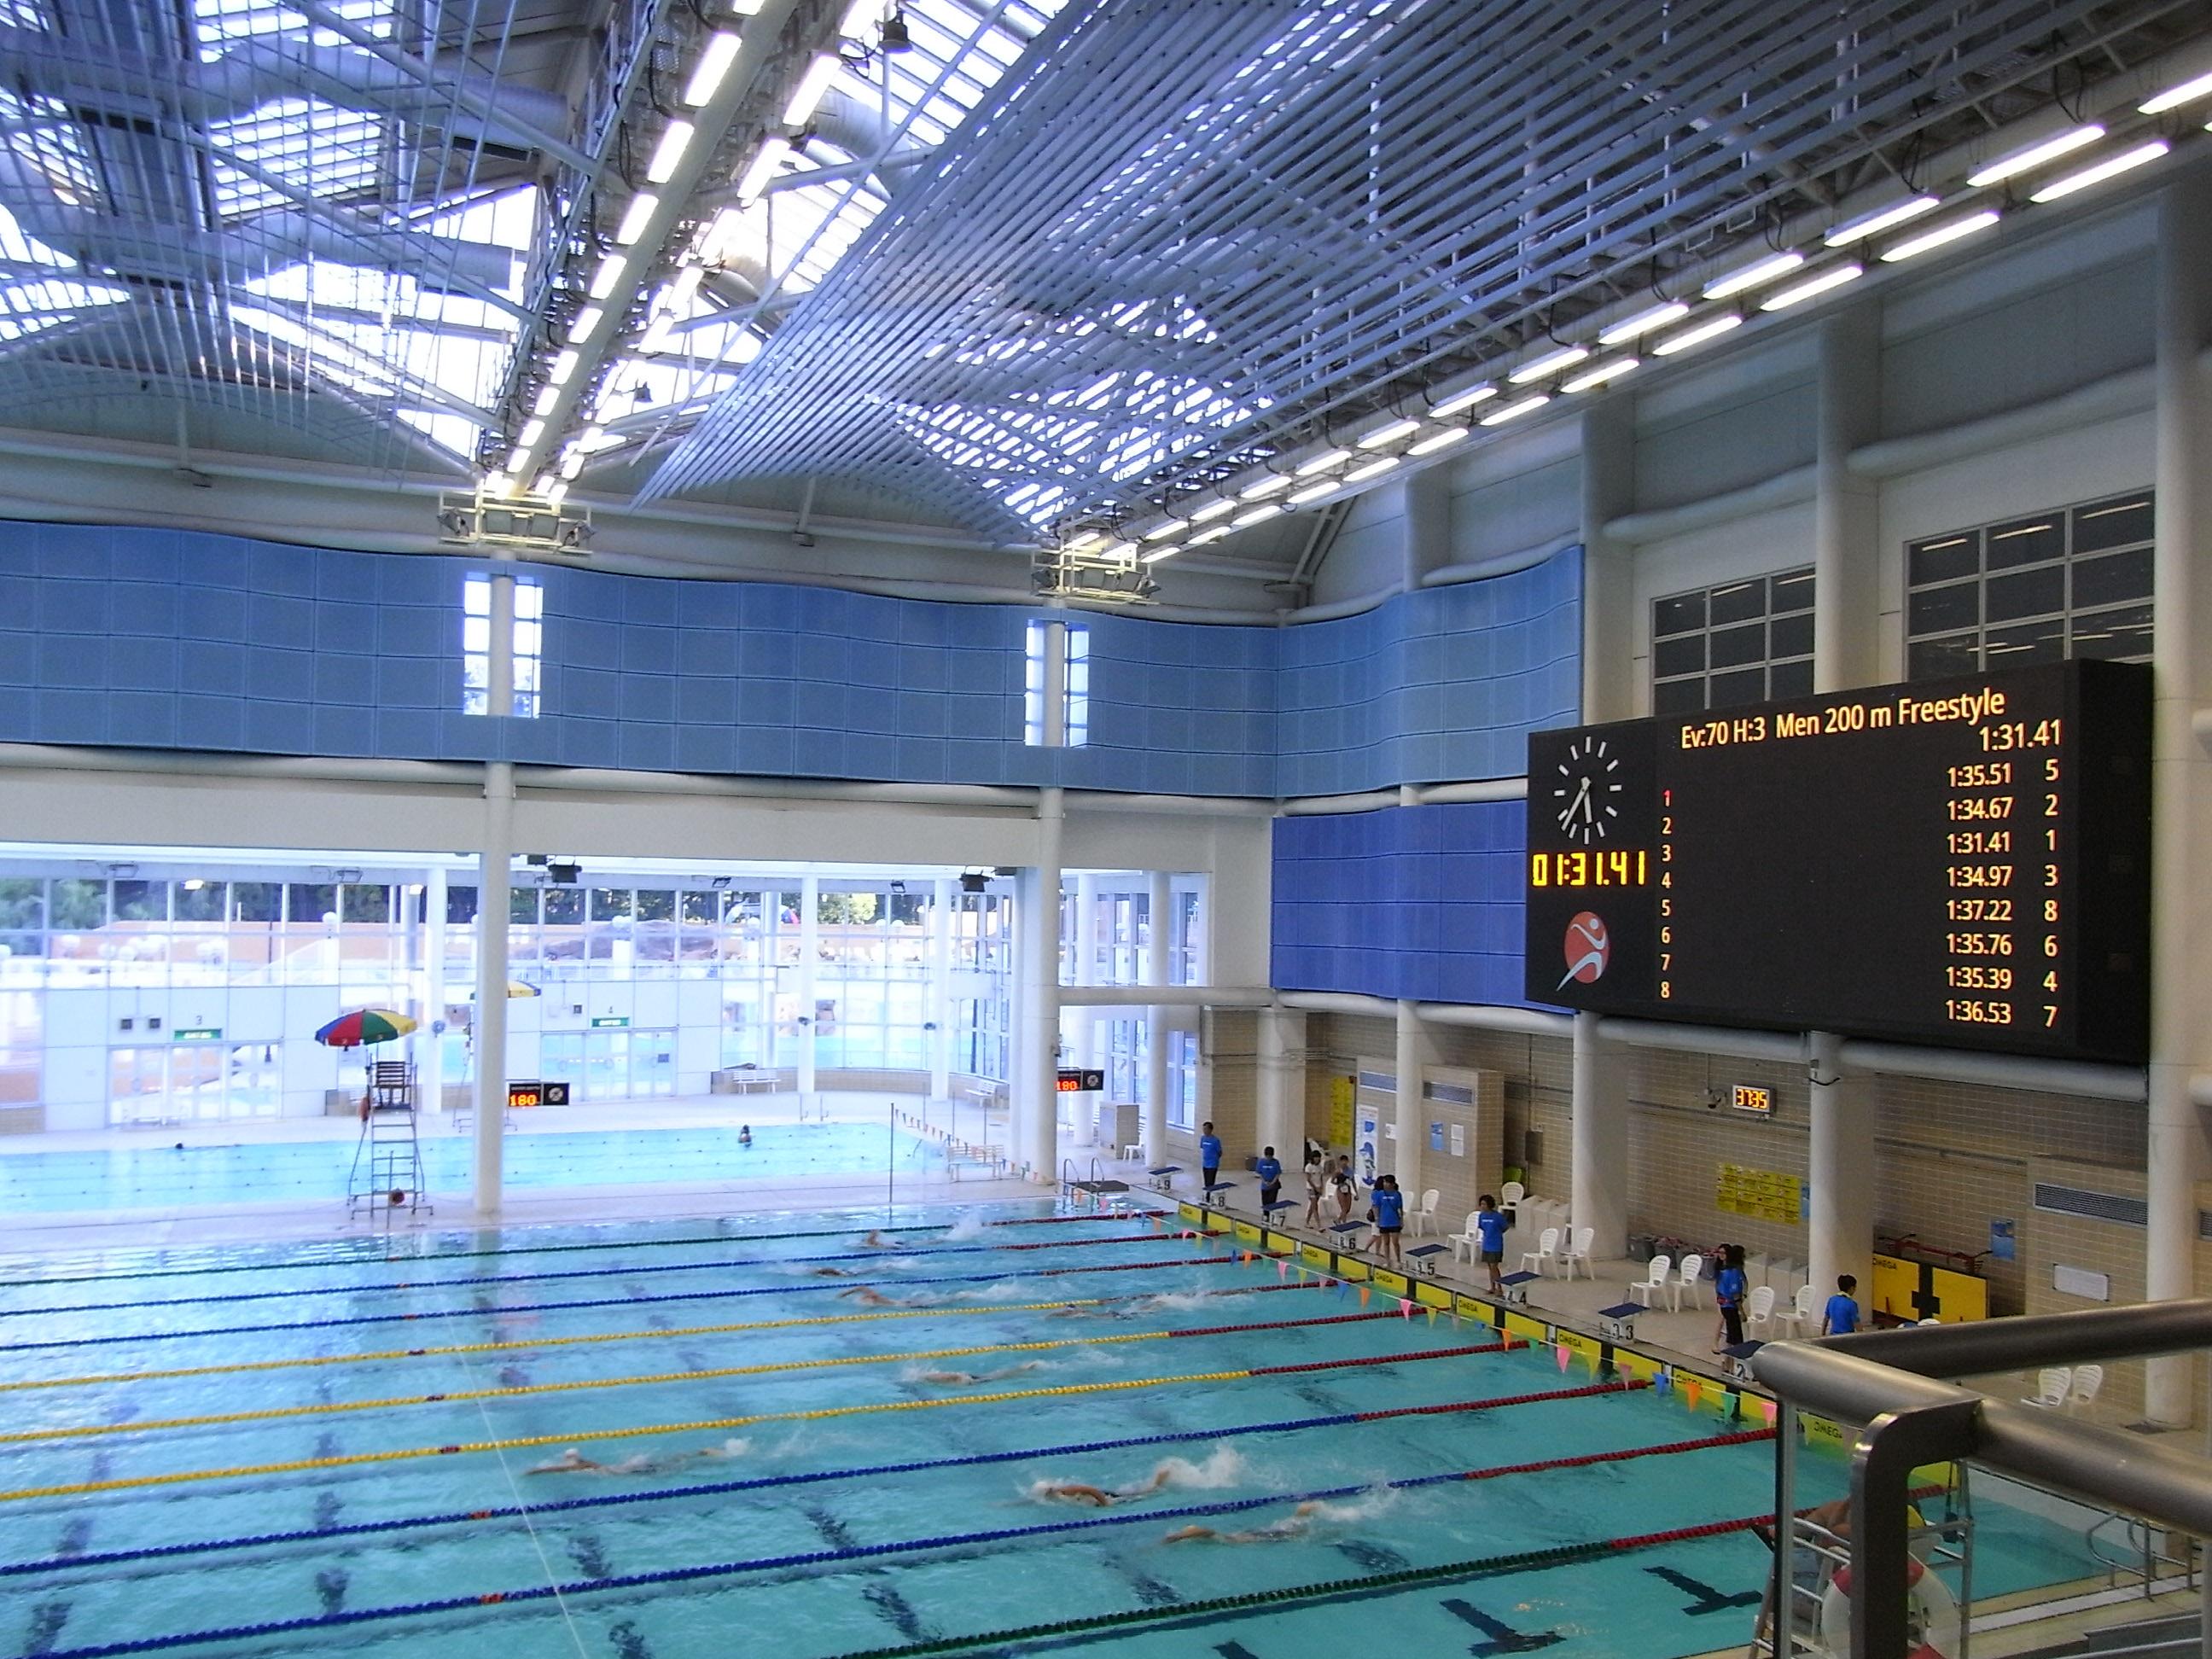 Indoor Public Swimming Pool file:hk tst kln park swimming pool 07 indoor july-2012